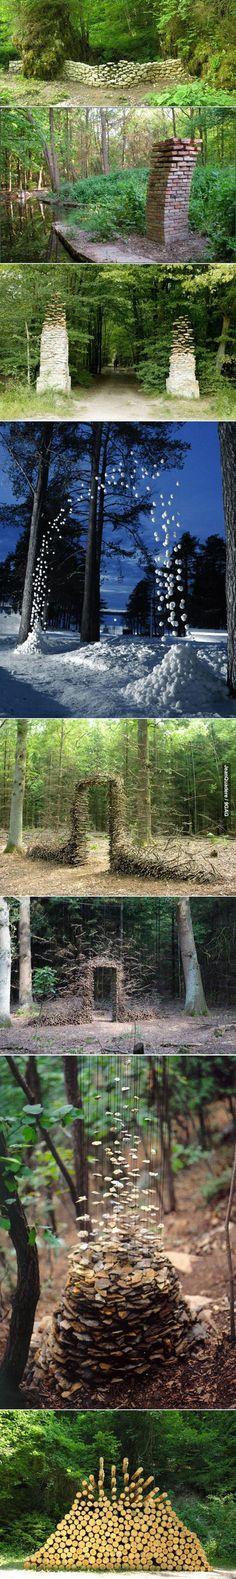 Gravity-defying sculptures by Cornelia Konrads | memolition #art #nature #sculptures #naturalmaterials #gravity #beautiful #outdoors #mindblown